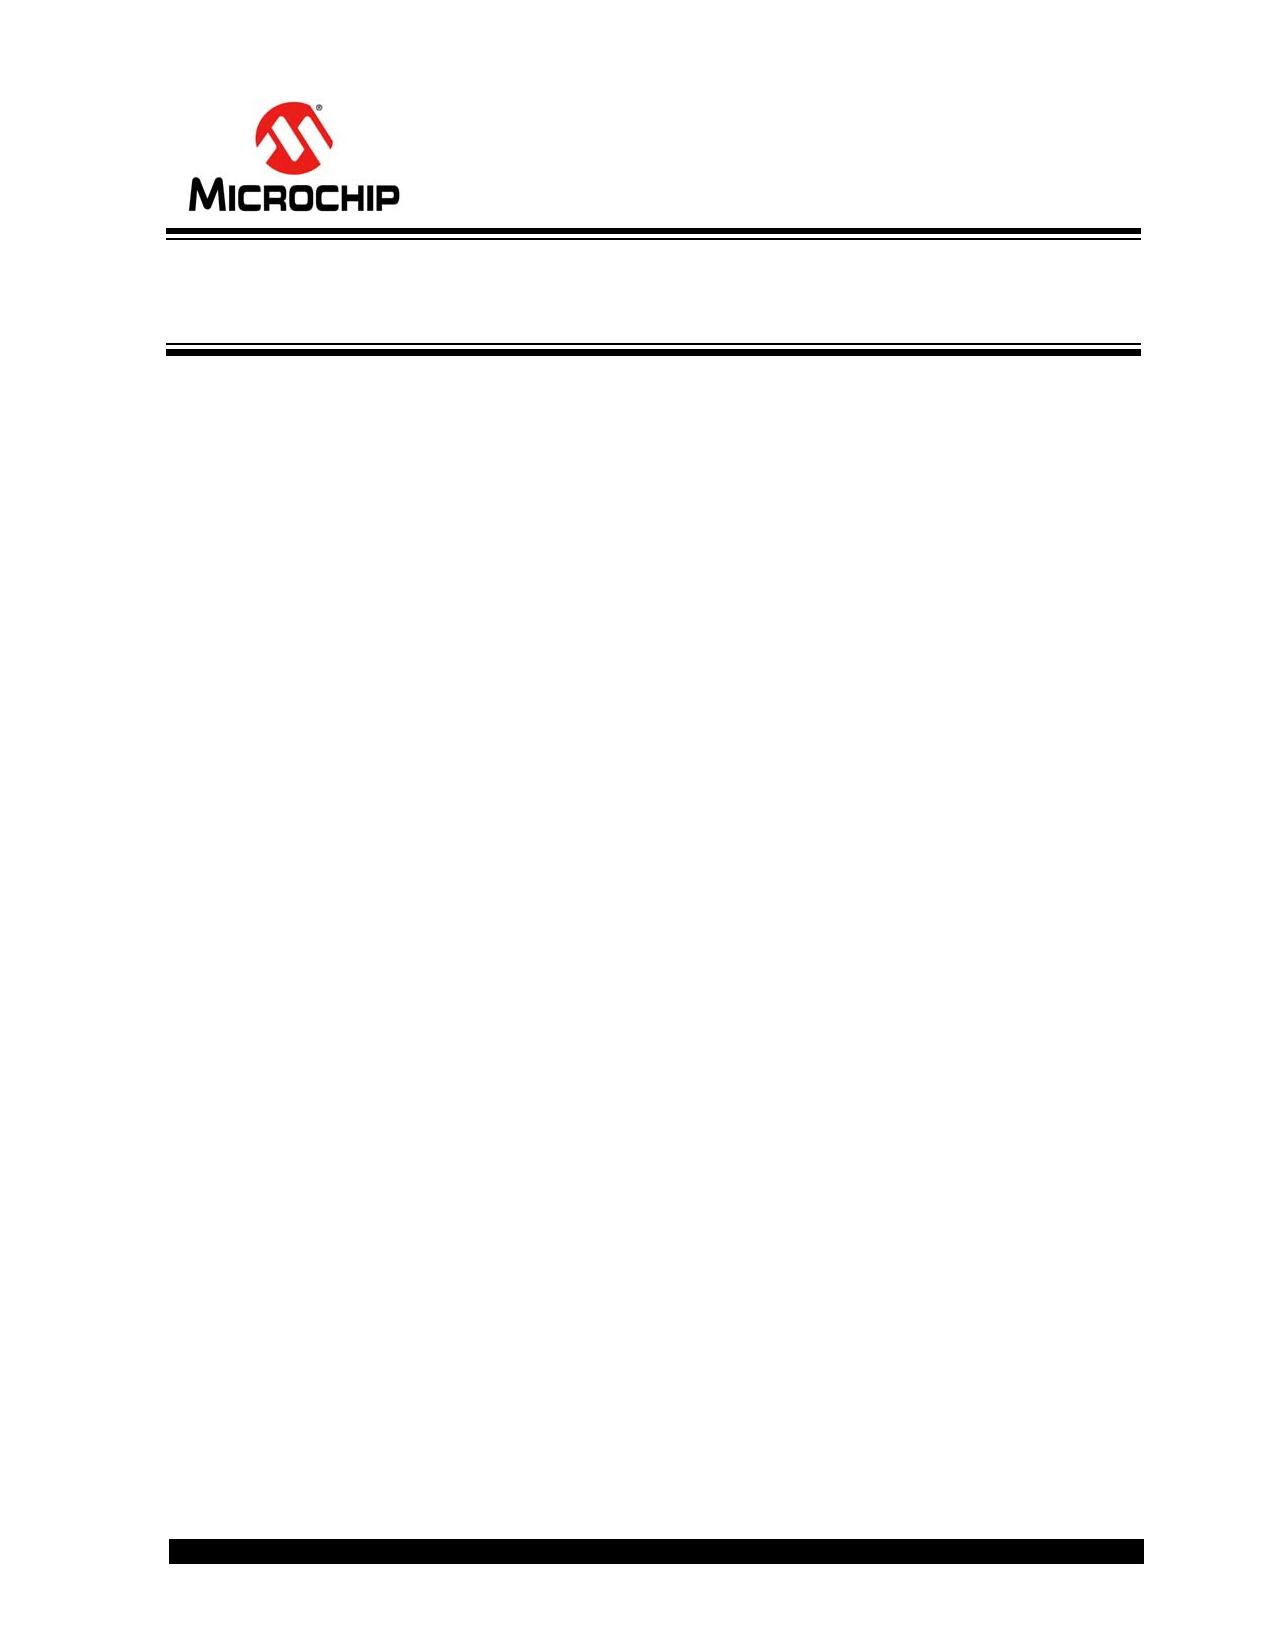 PIC24F32KA304 데이터시트 및 PIC24F32KA304 PDF